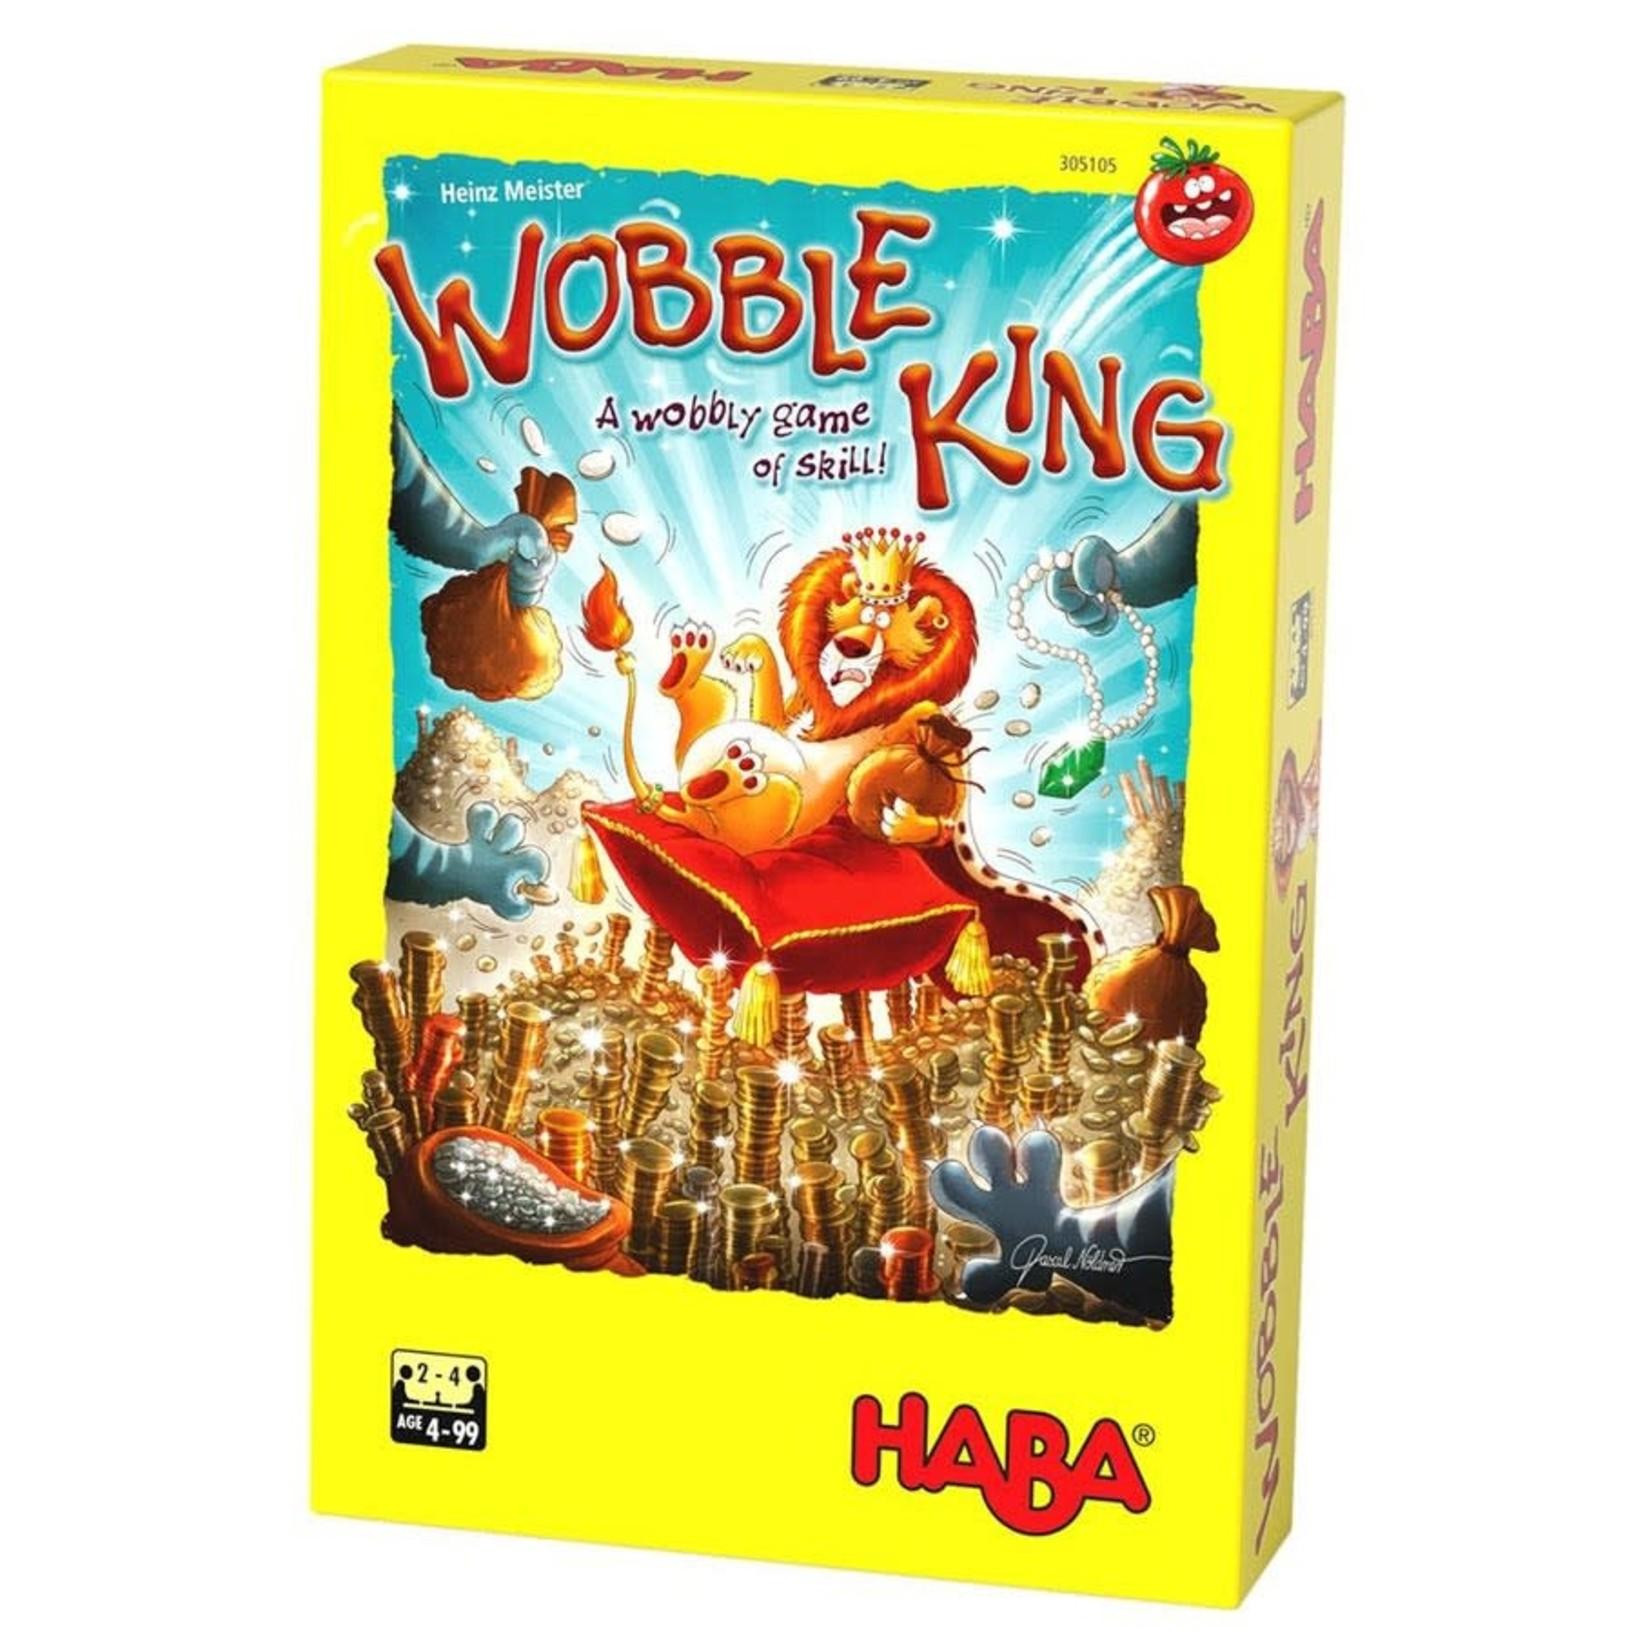 Haba Wobble King